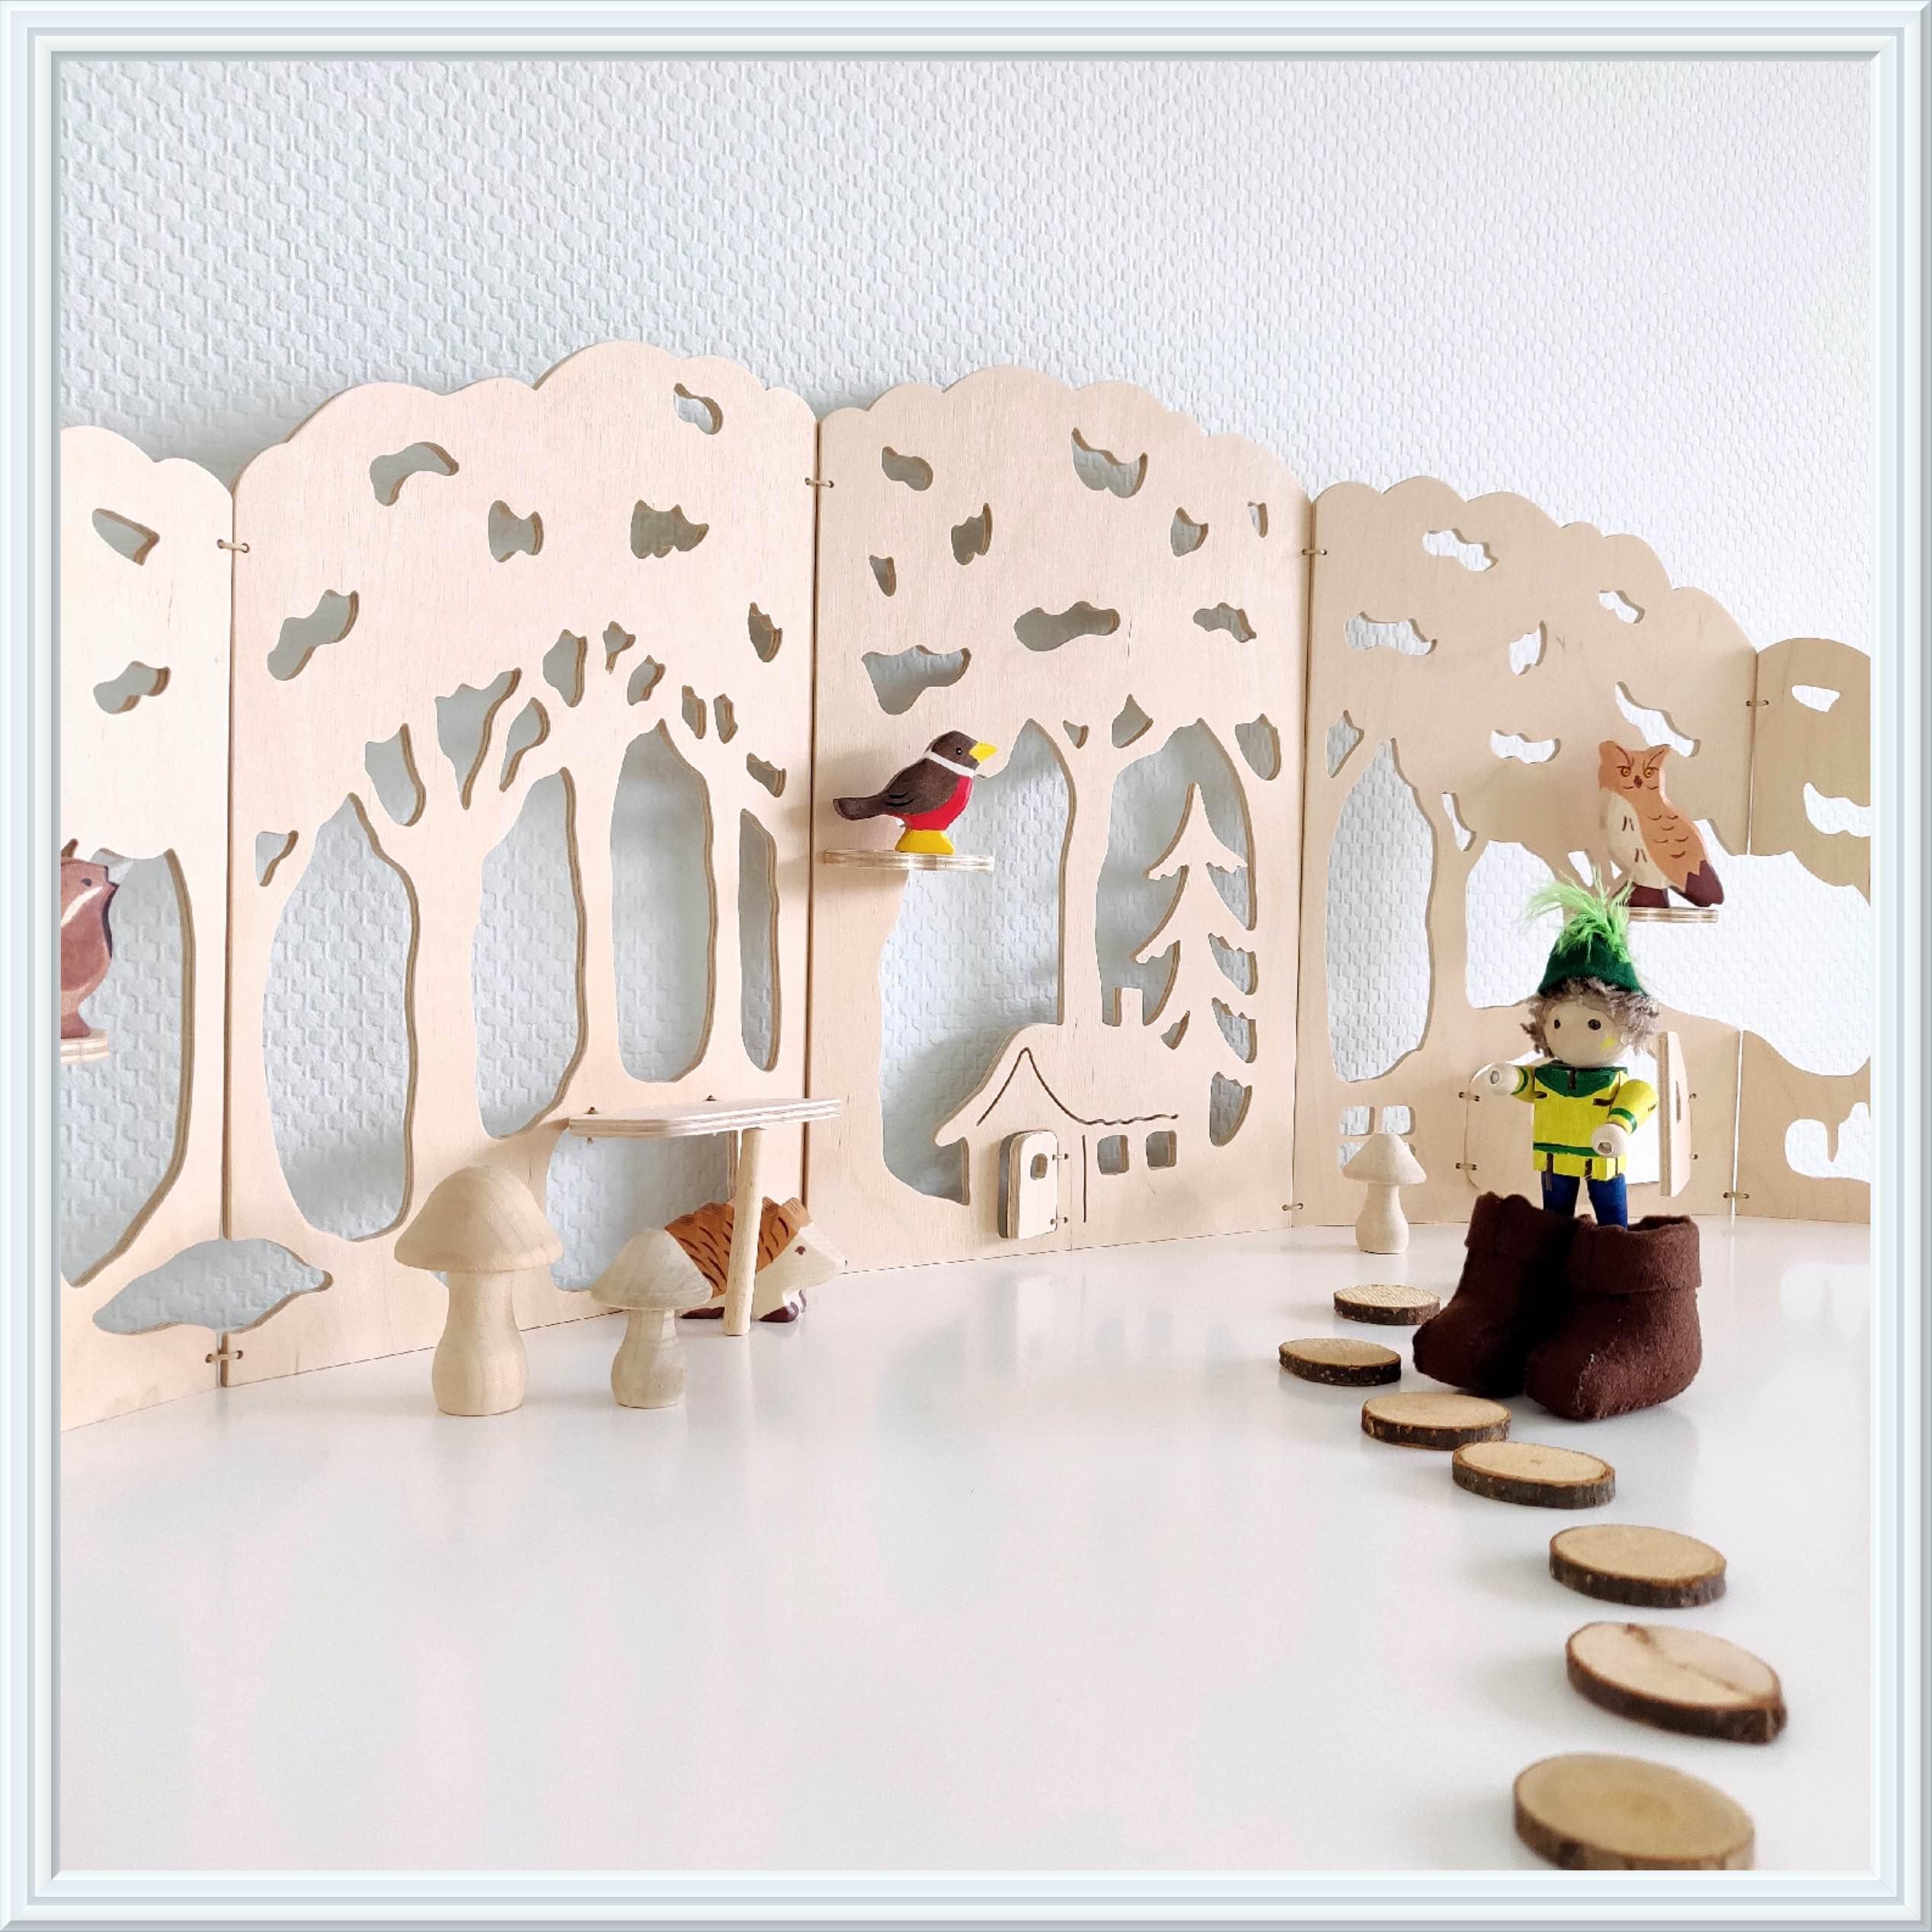 klein duimpje met houten speelgoed / tom thumb